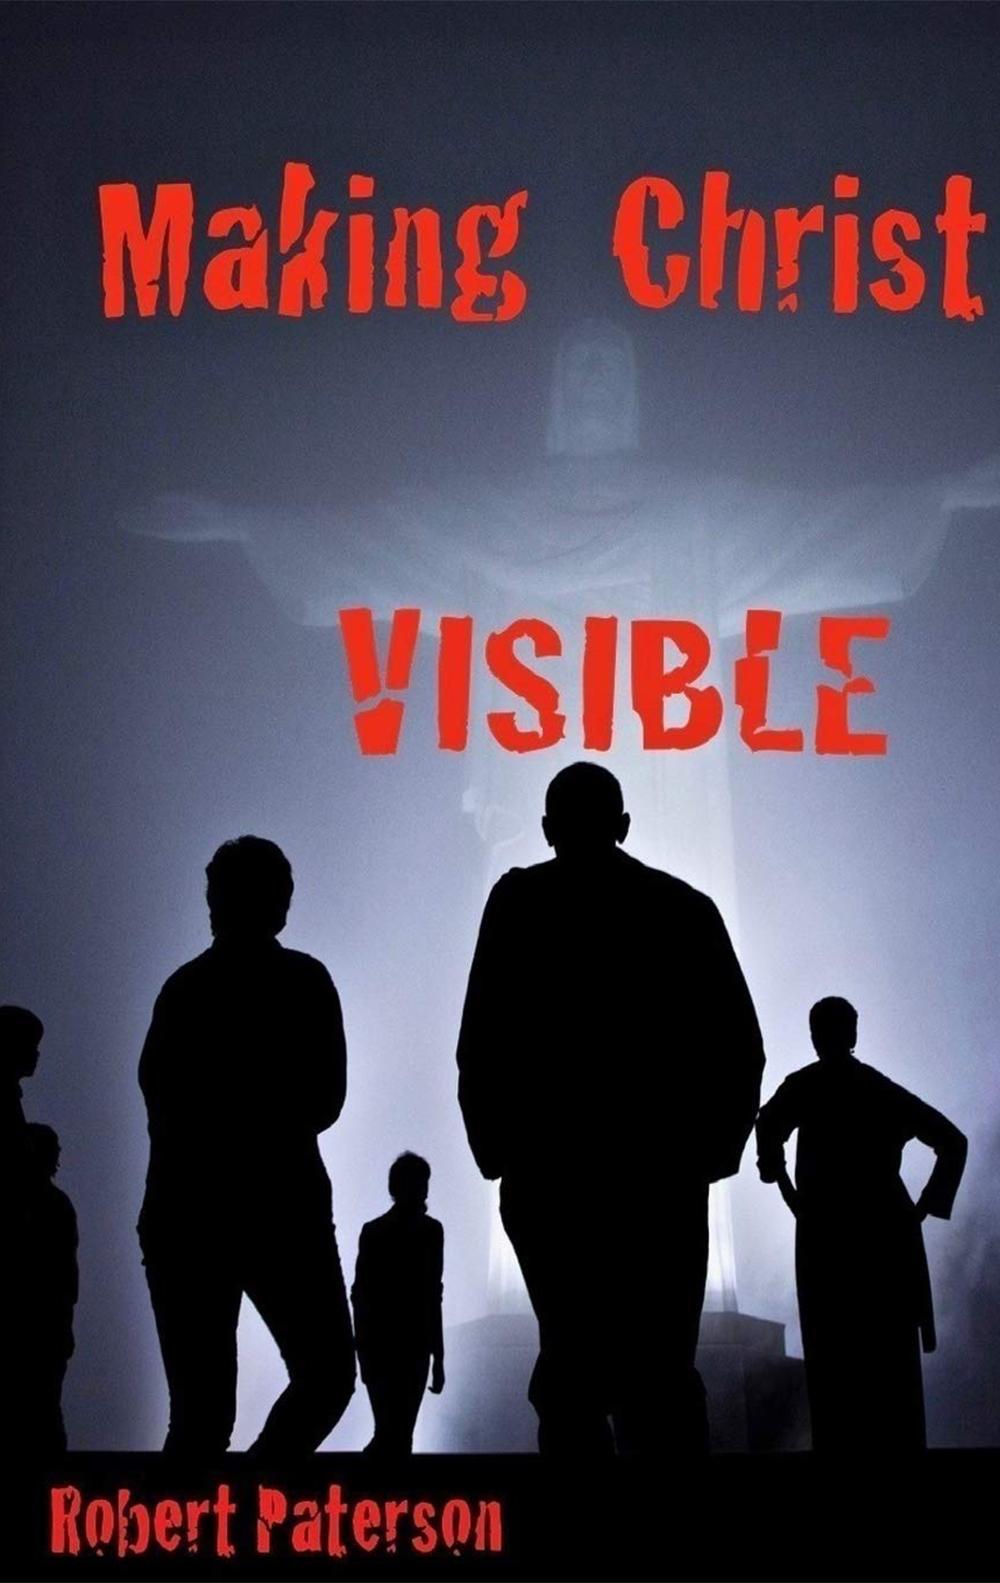 Making Christ Visible